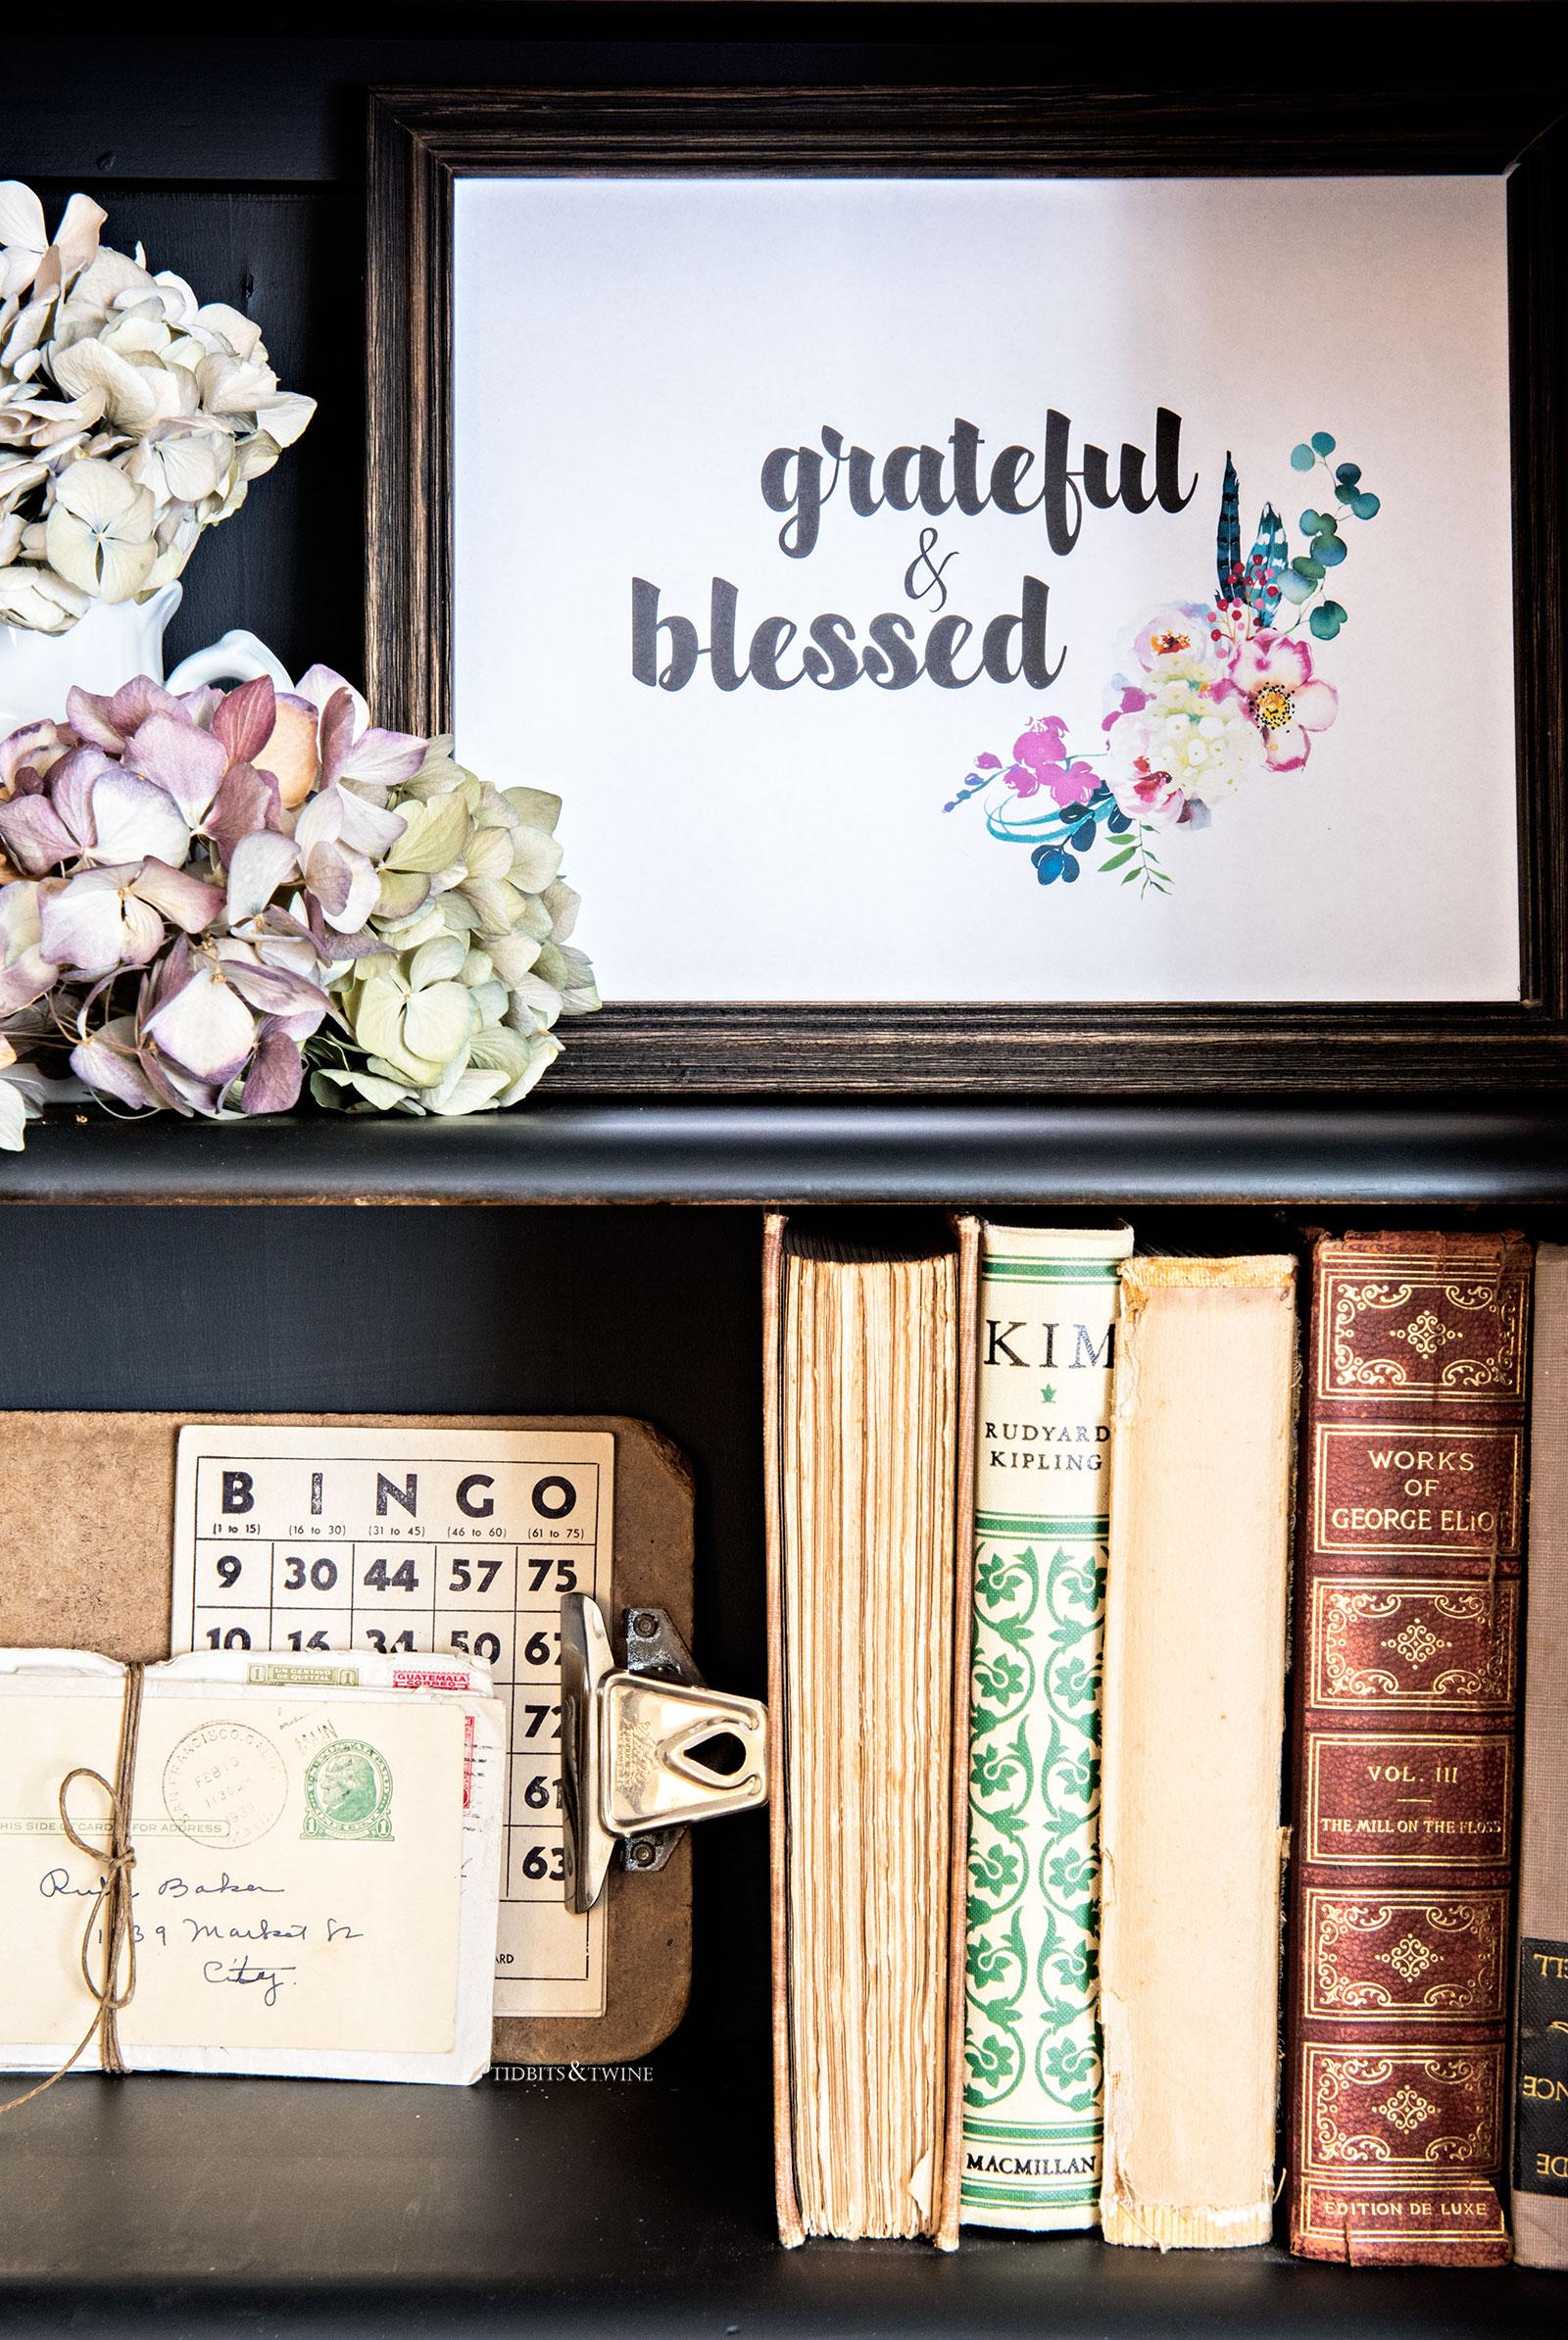 Fall printable is styled bookshevles